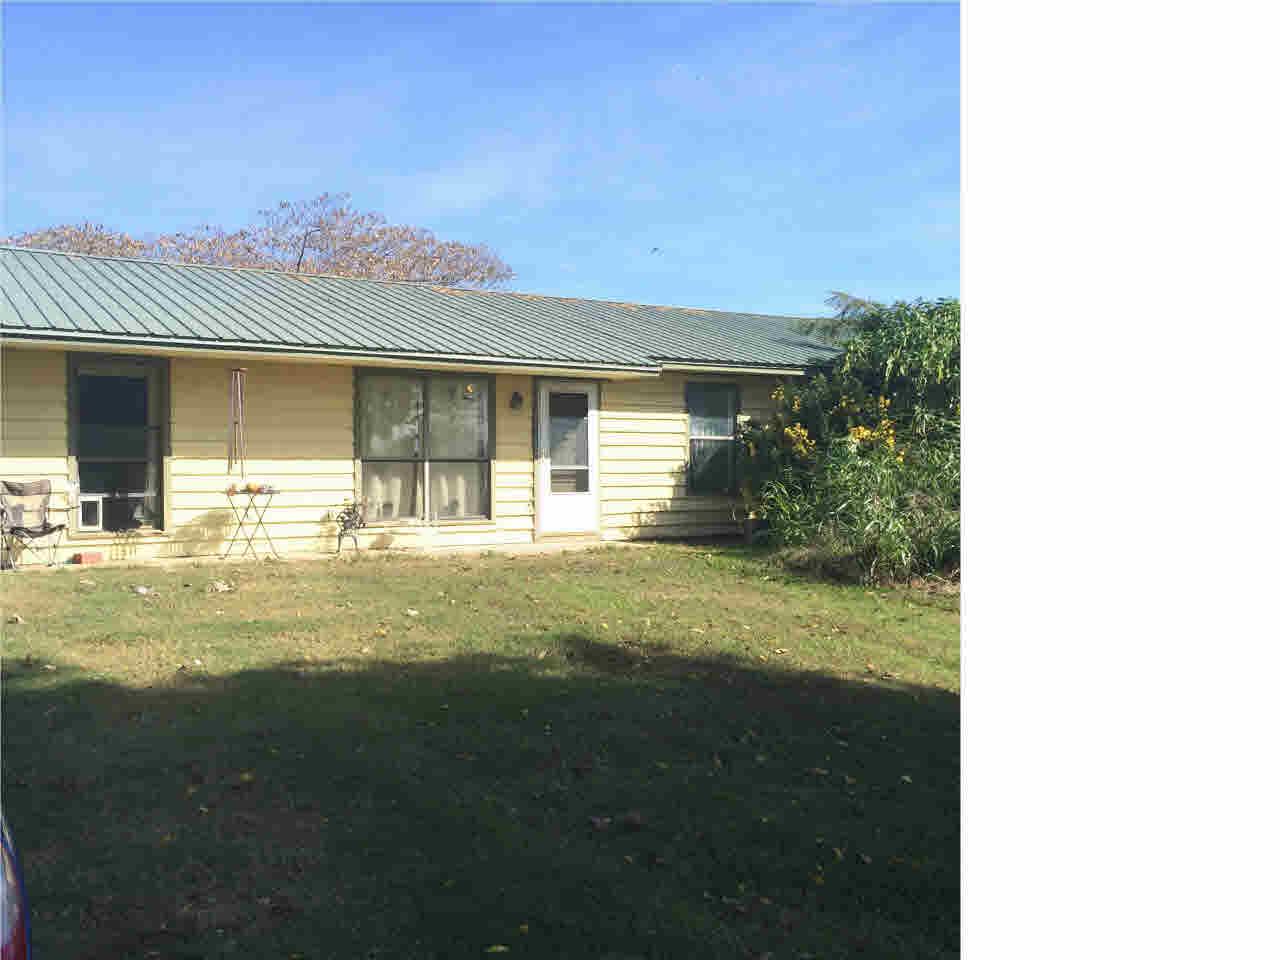 Real Estate for Sale, ListingId: 32546544, Vicksburg,MS39183